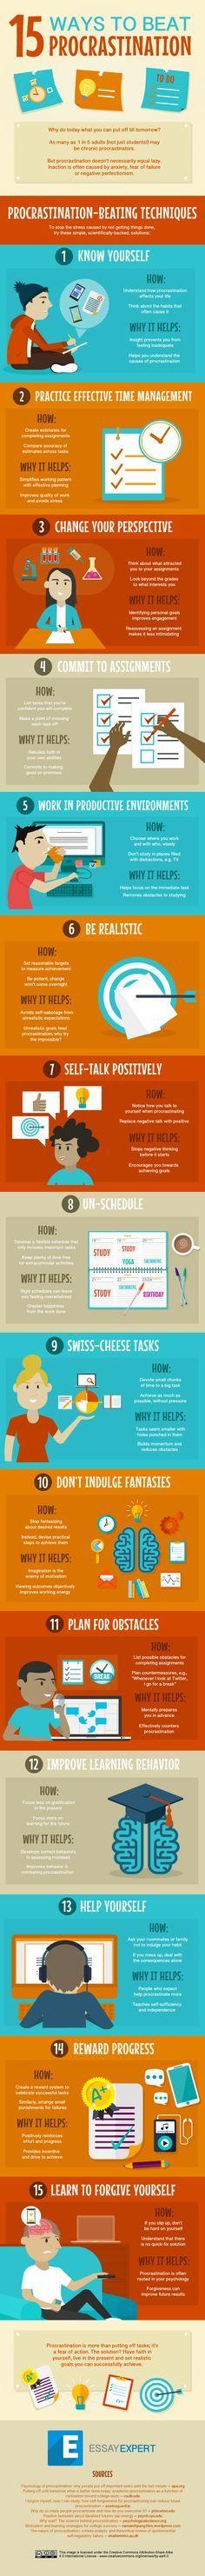 15-ways-overcome-procrastination-get-stuff-done-infographic